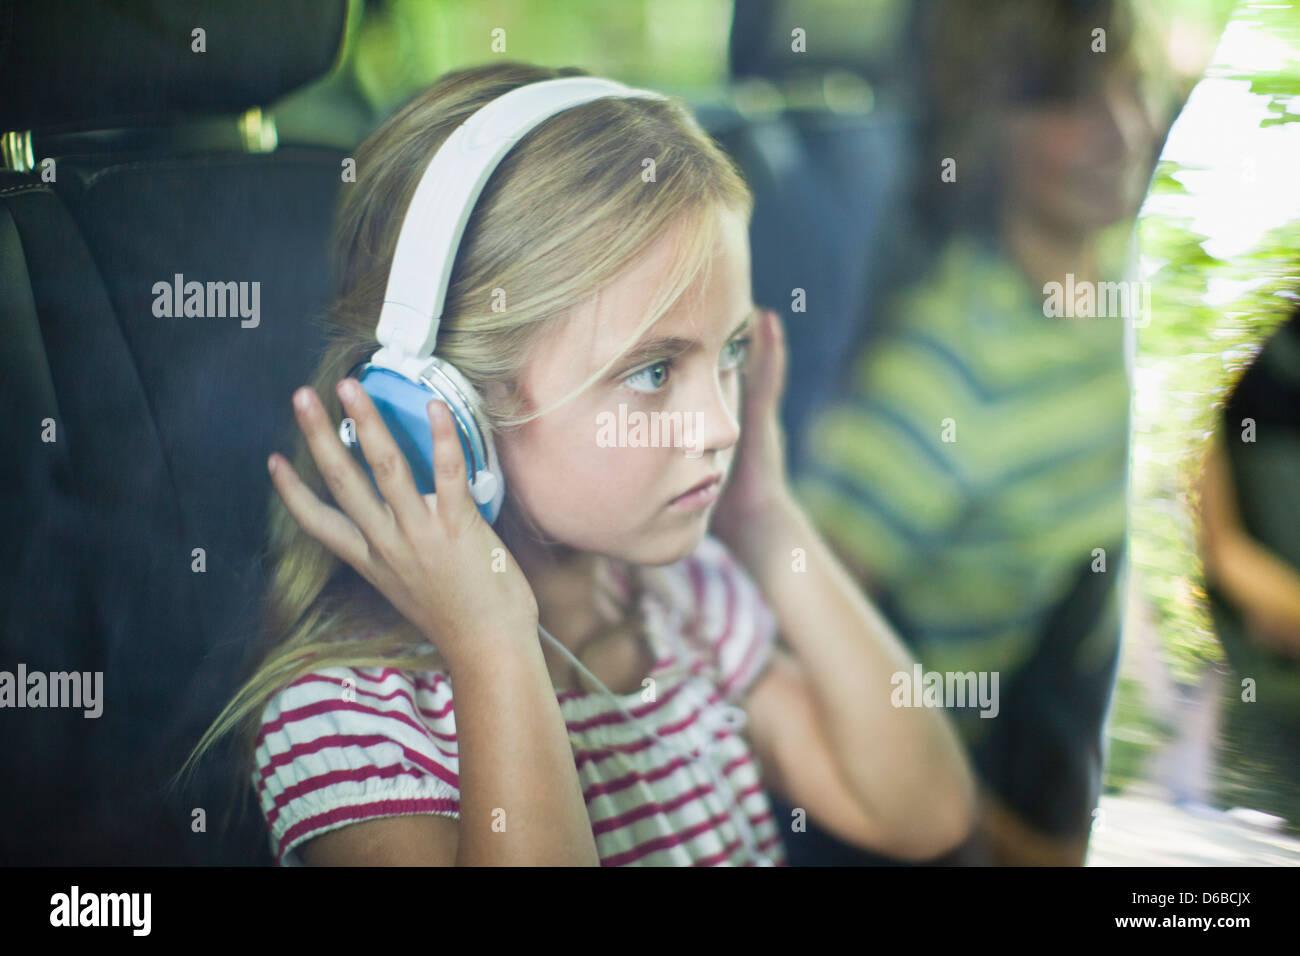 Girl listening to headphones in car Stock Photo